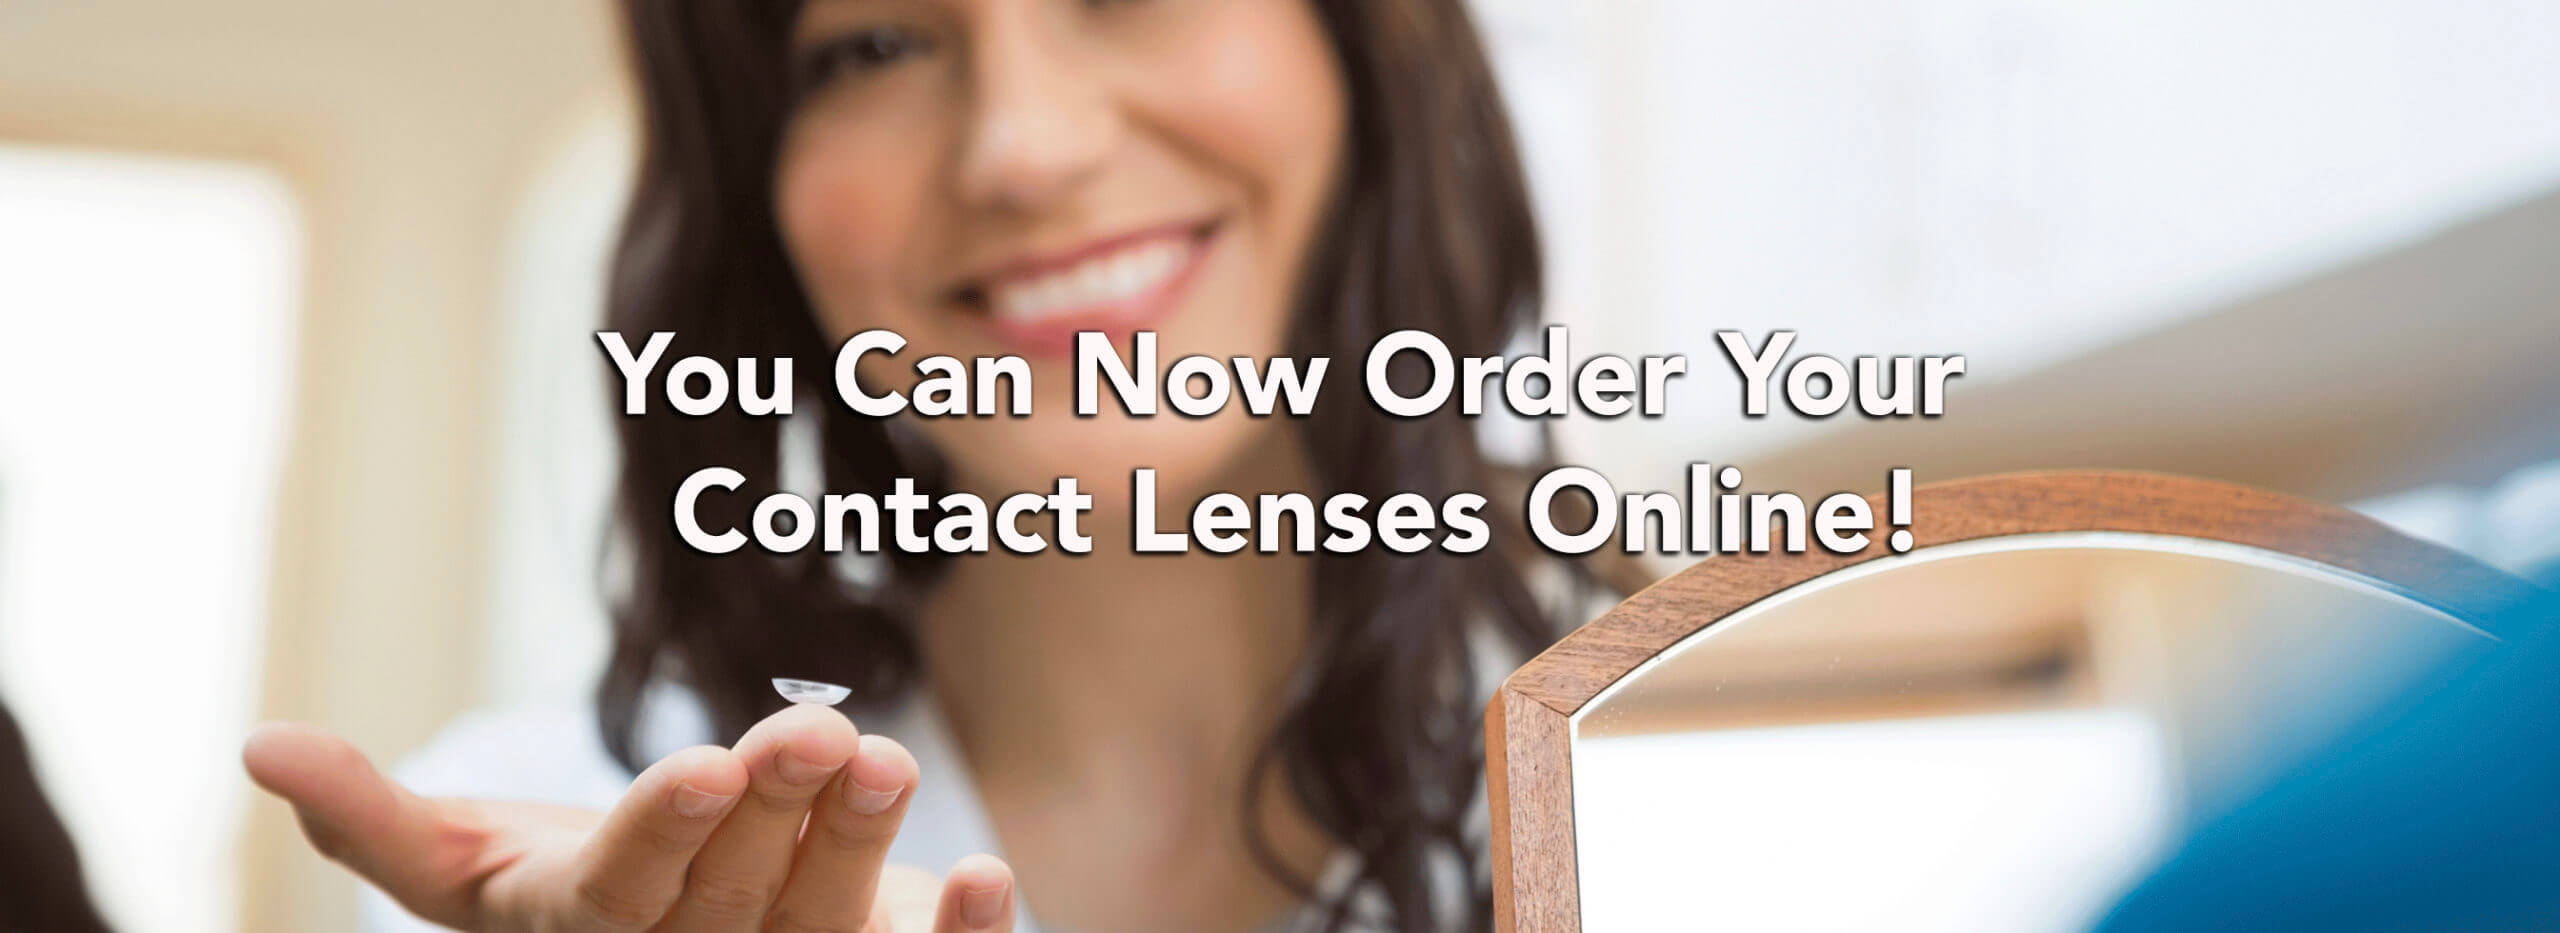 ContactLenses